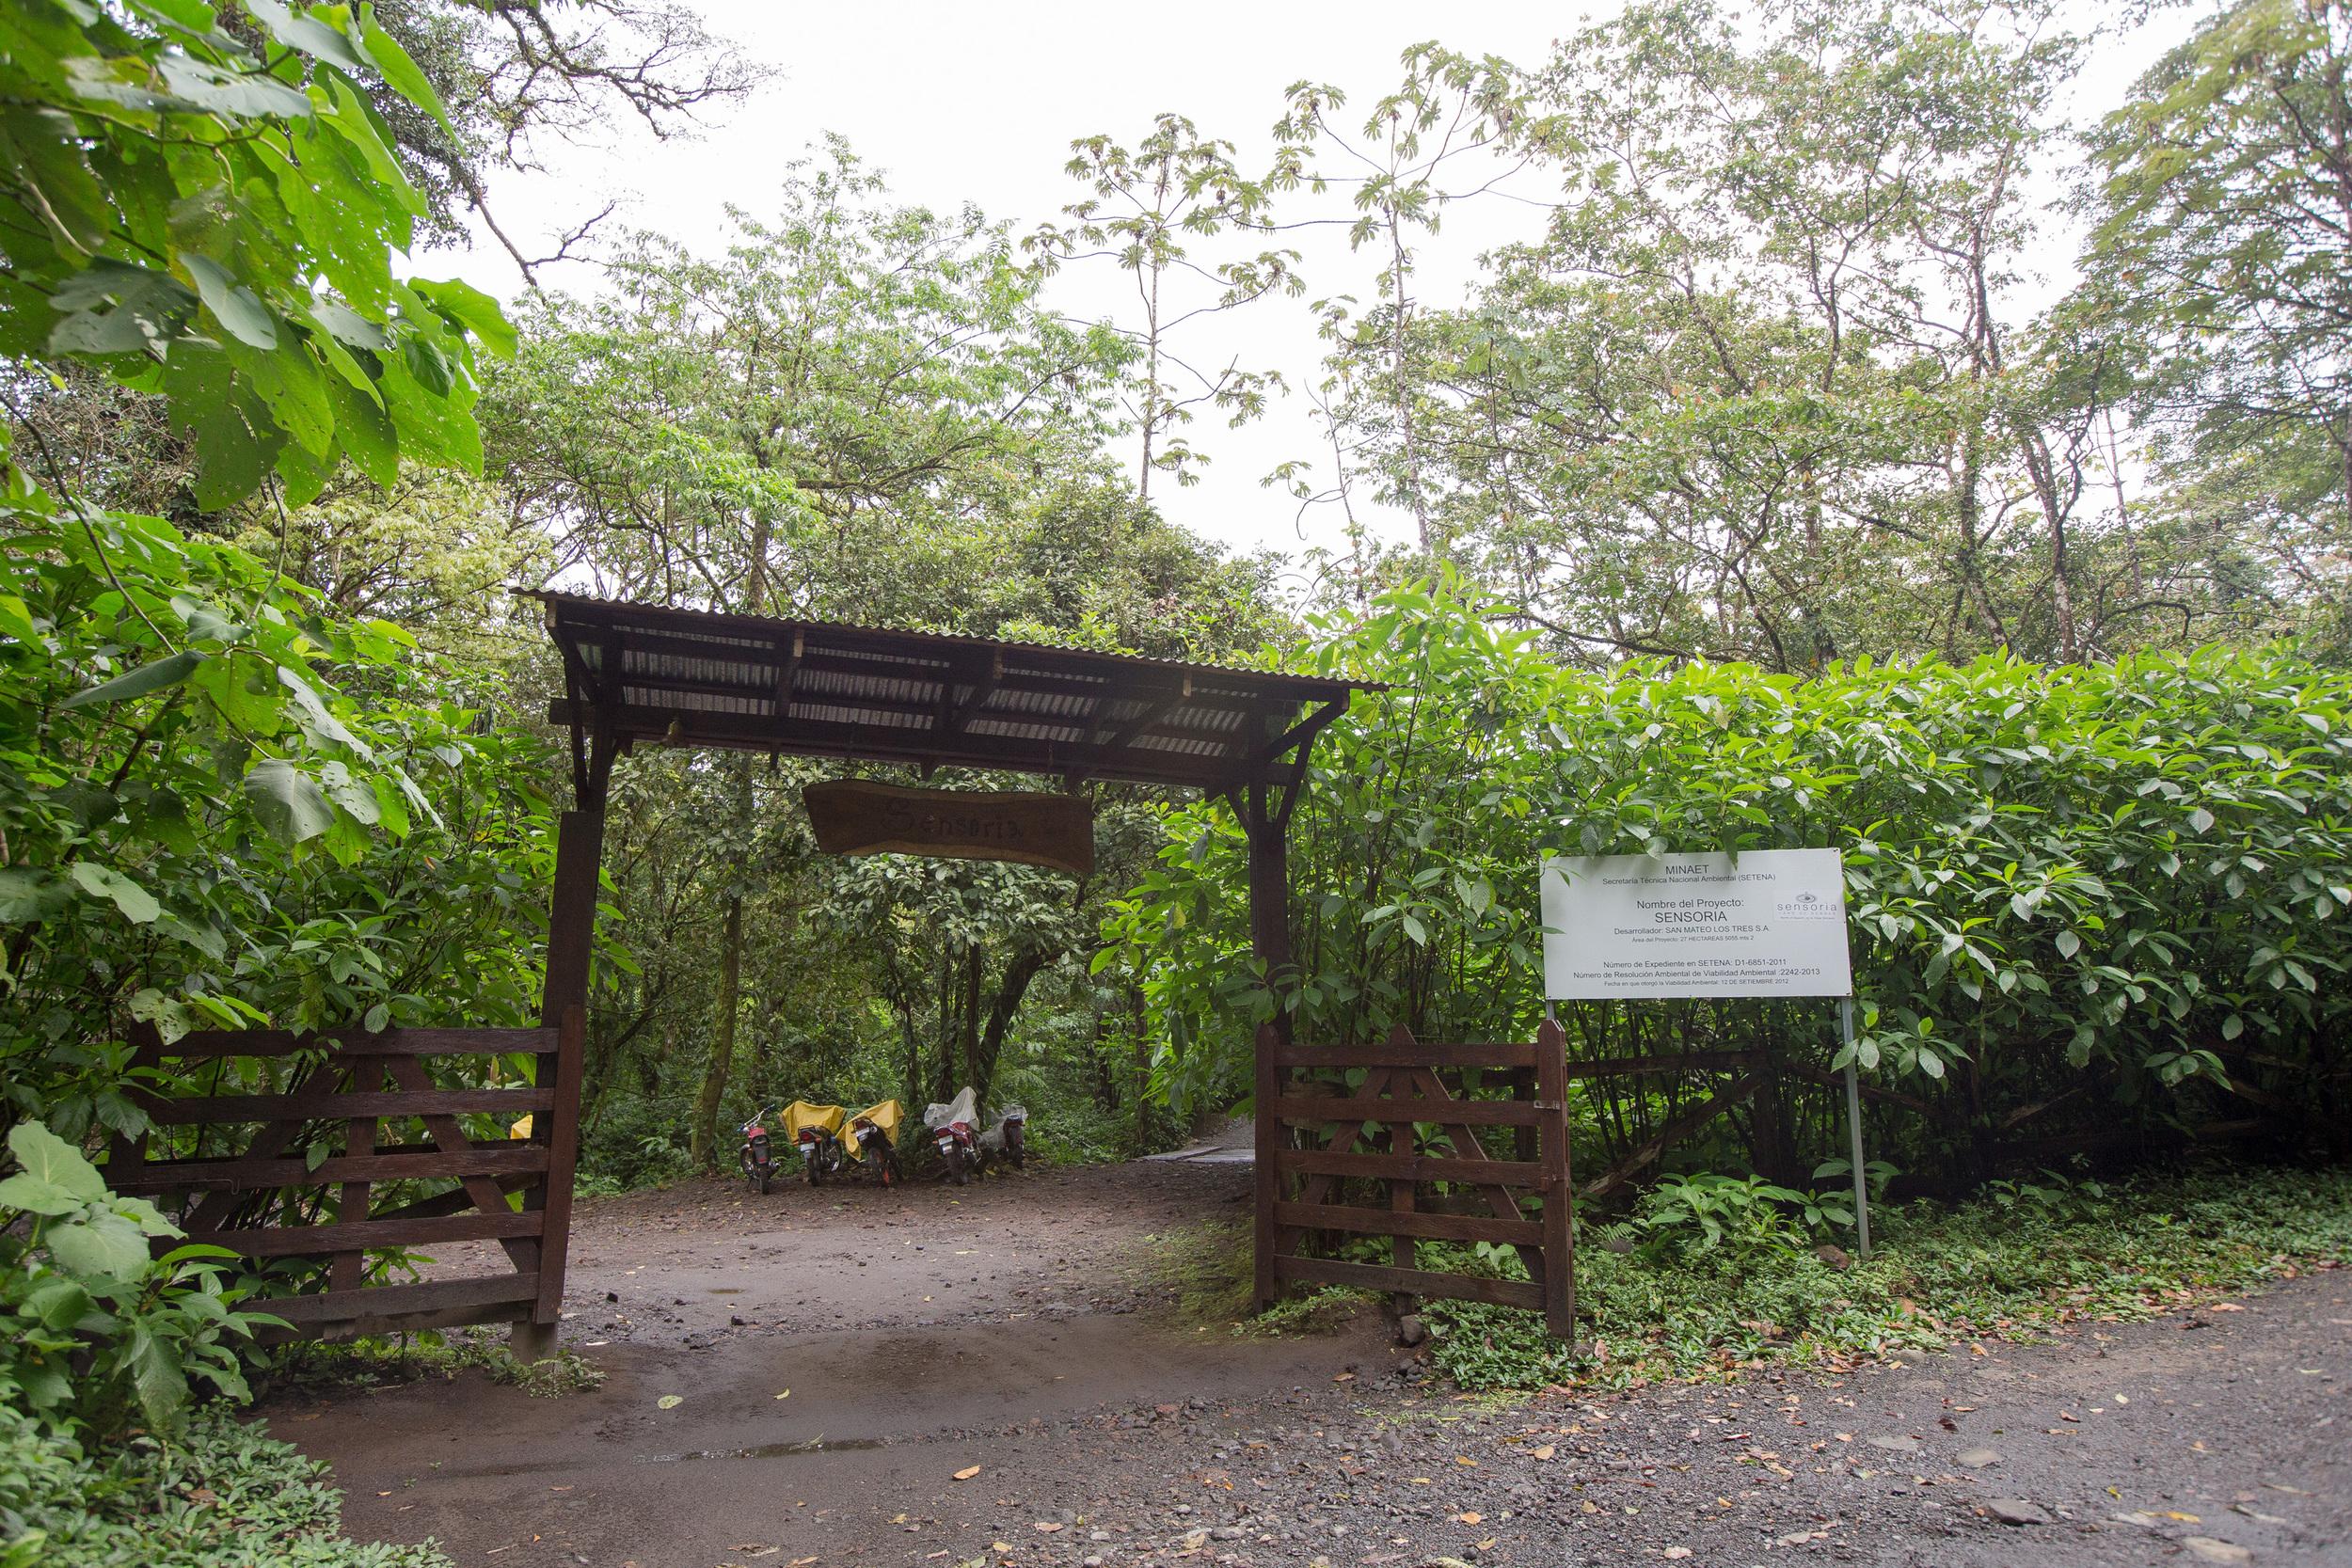 Sensoria Costa Rica sign